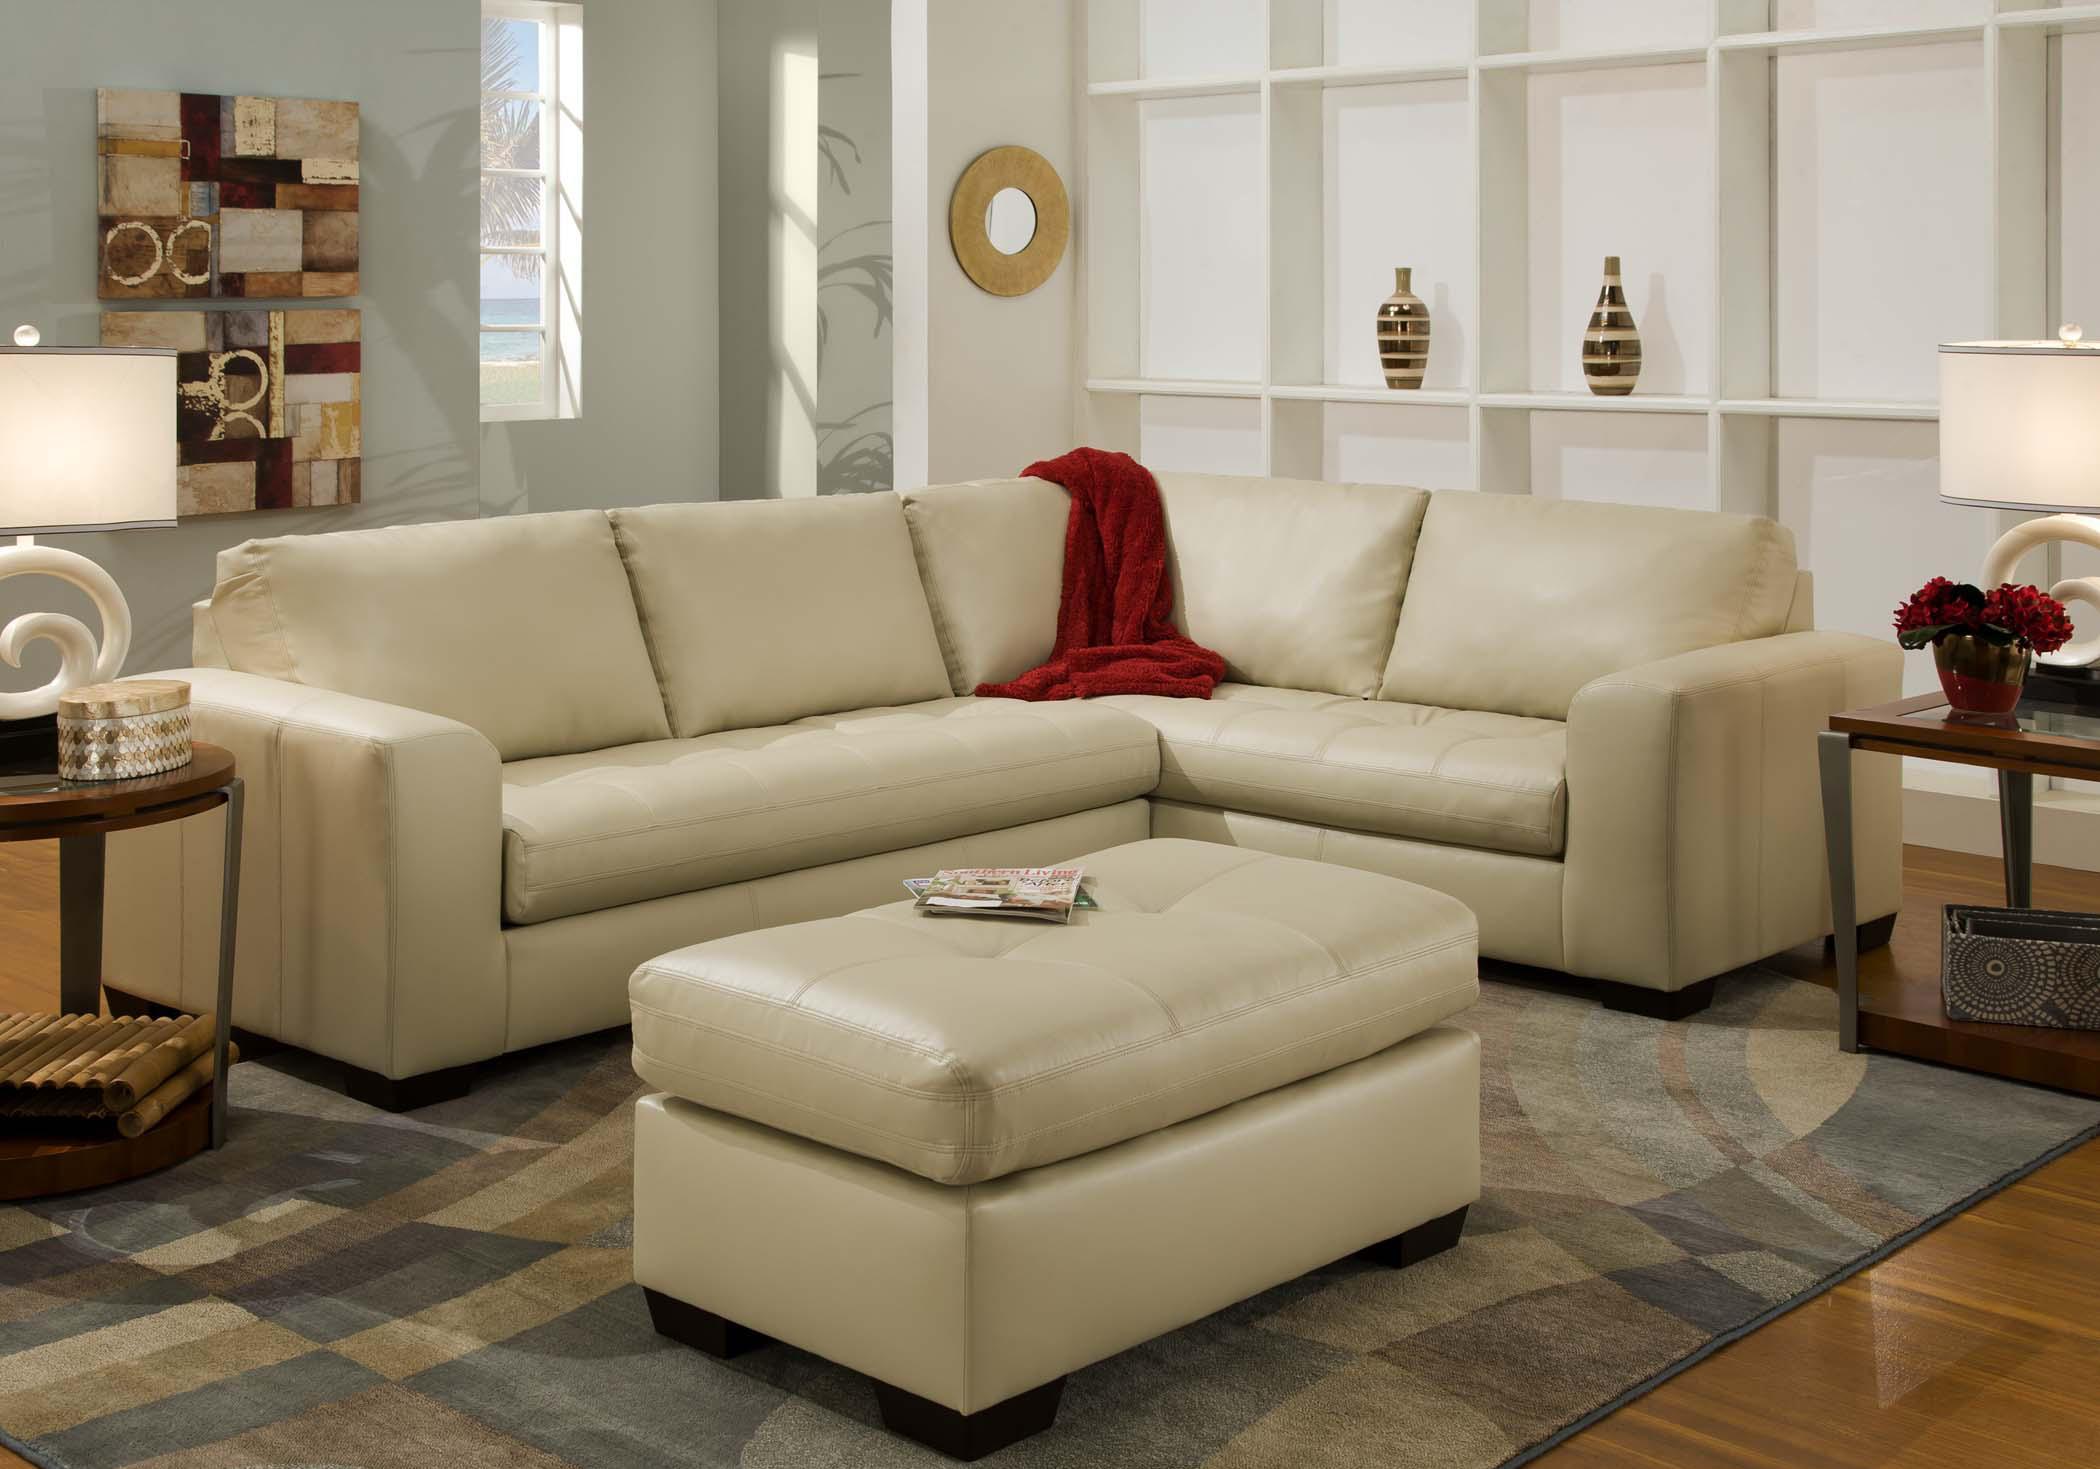 American Furniture 1230 Sectional Sofa - Item Number: 1231+1234-8800